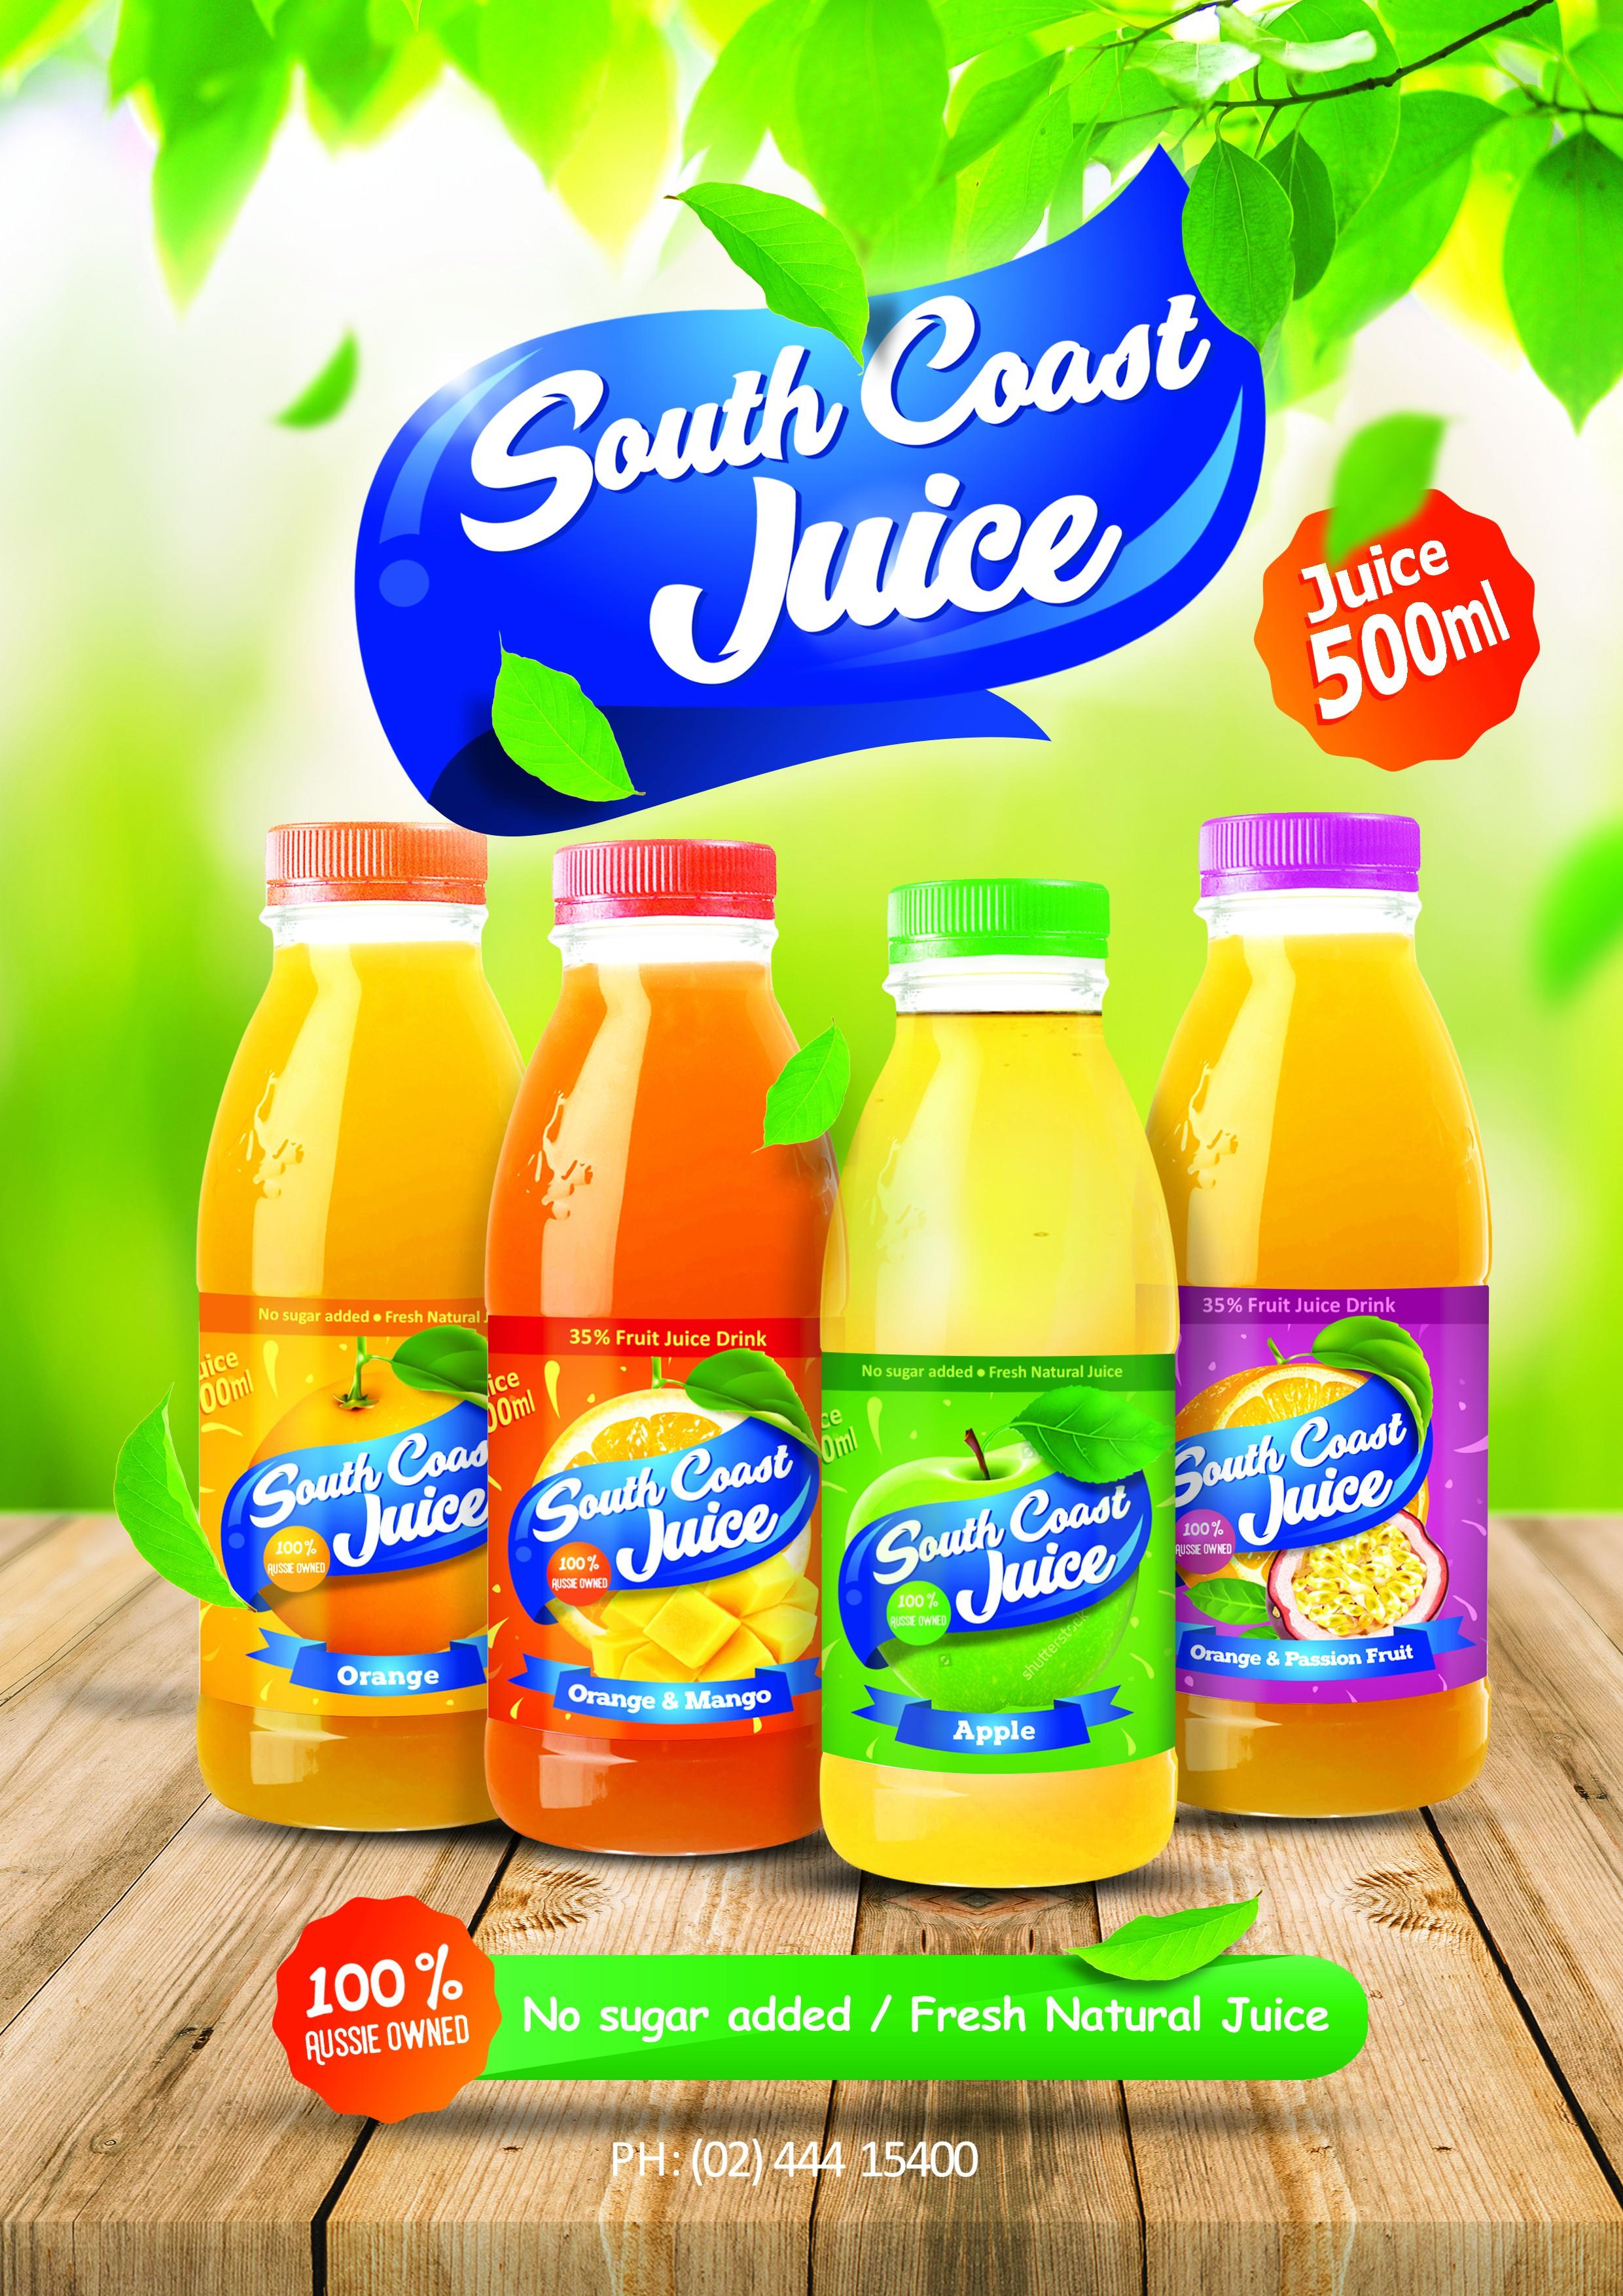 south coast juice posters